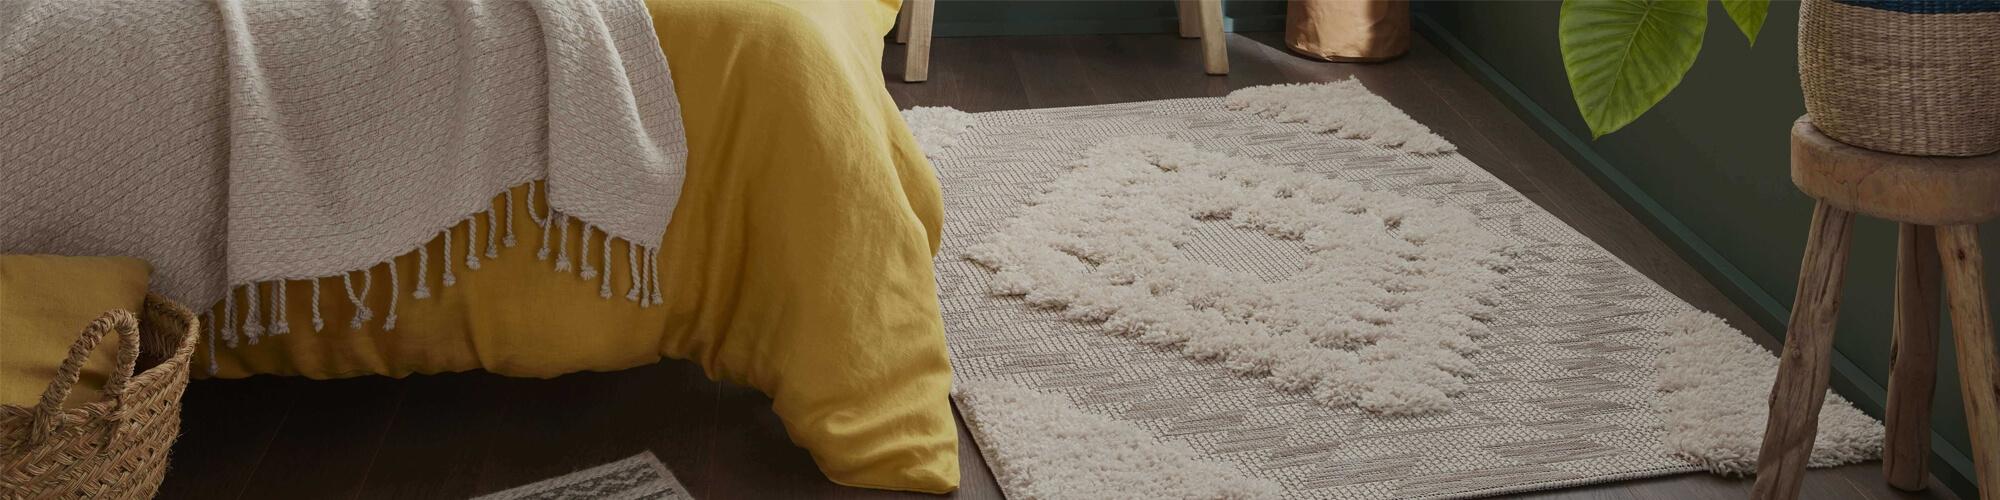 Achat tapis moderne